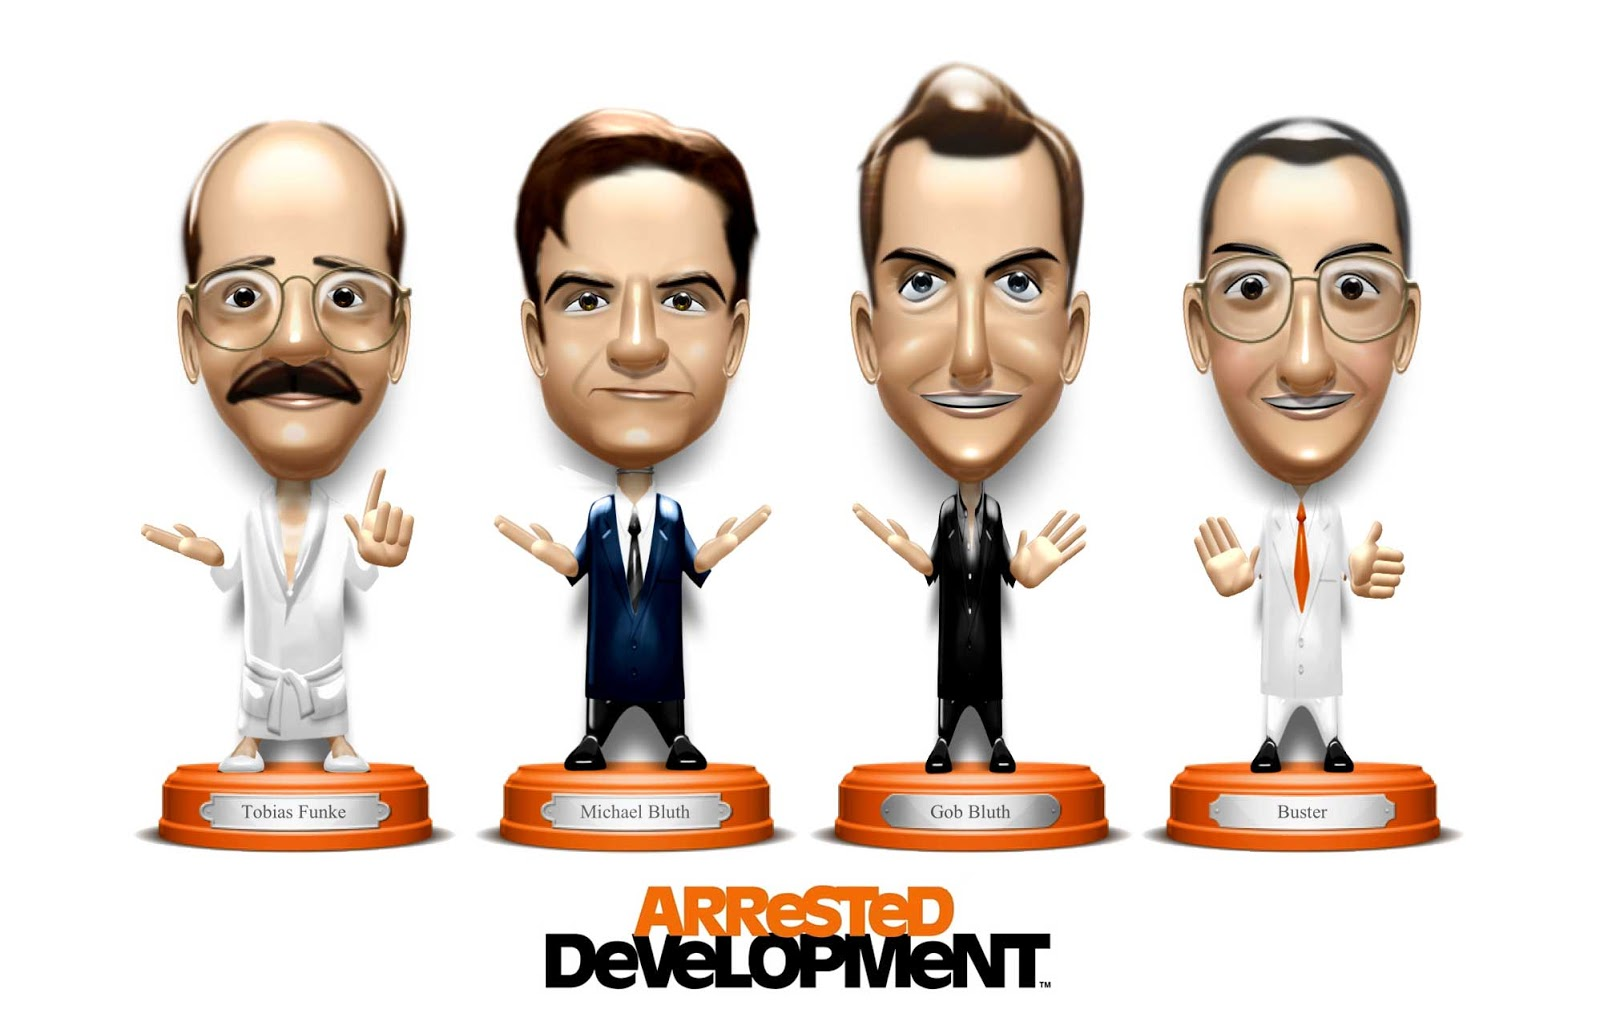 Arrested Development Bobble heads